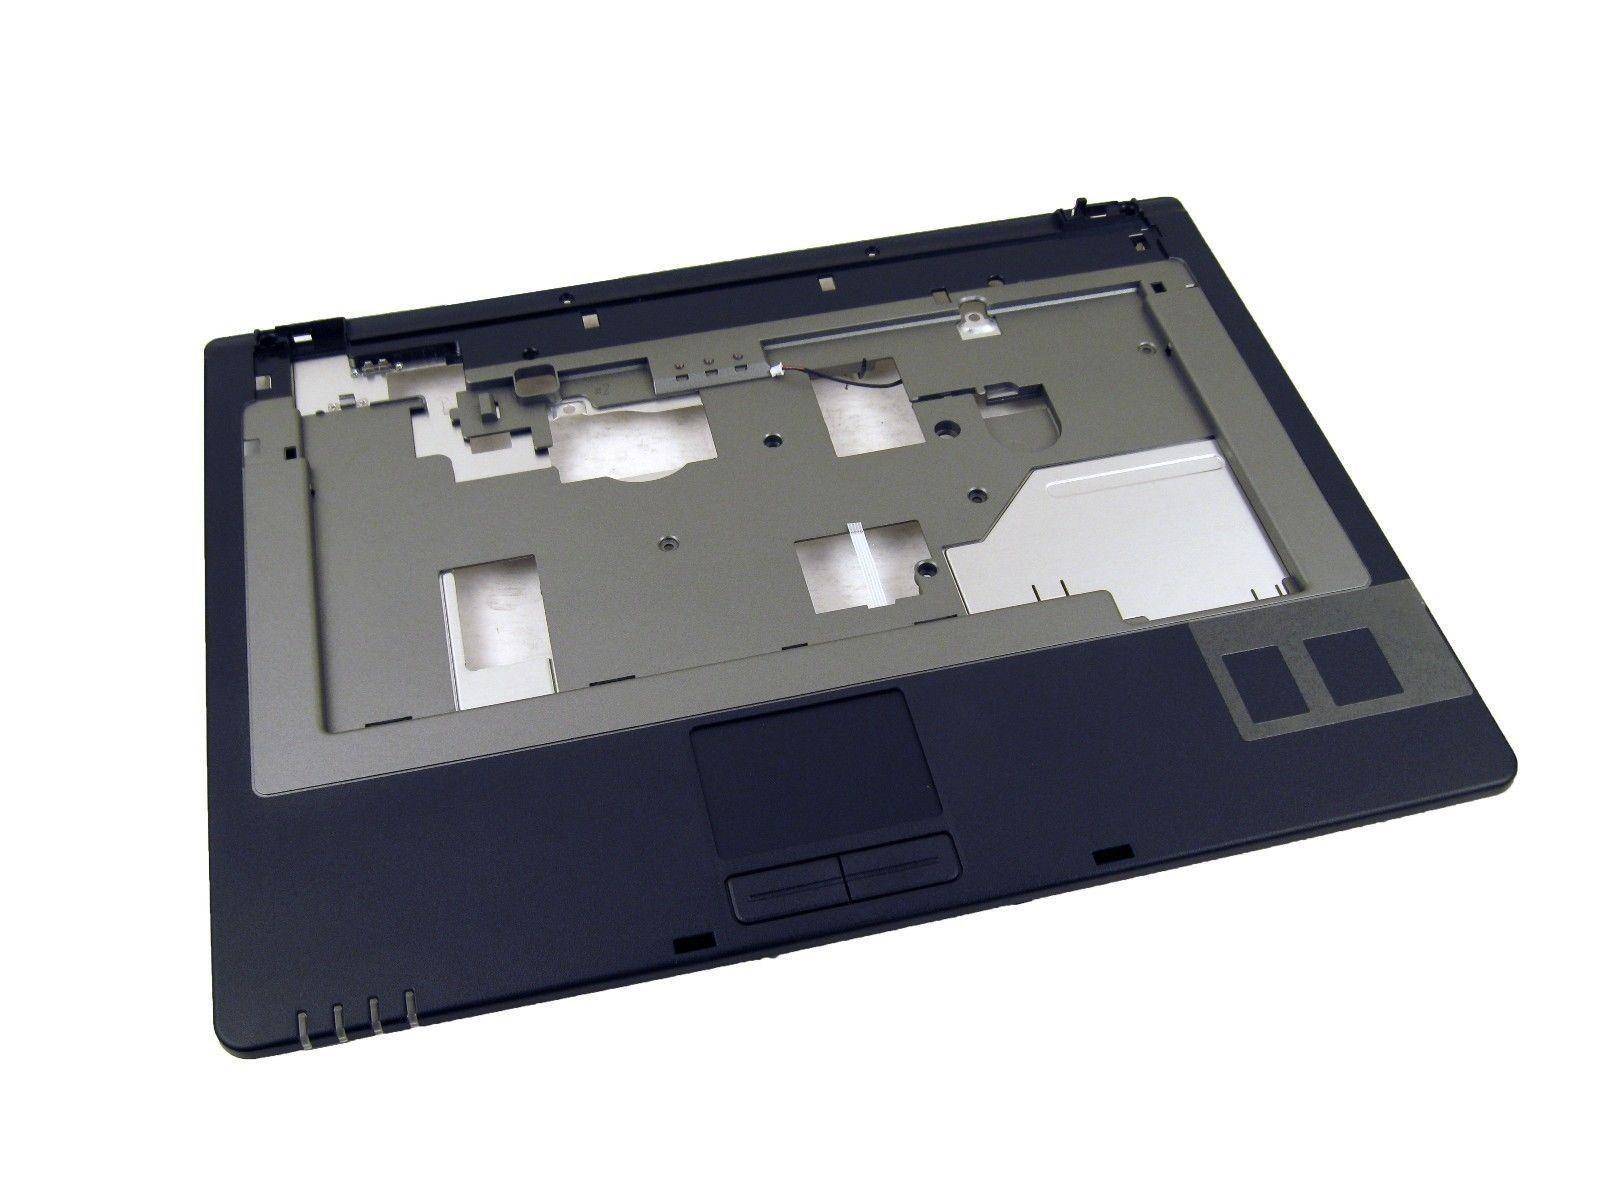 Dell JD880 Inspiron B130 B120 1300 Laptop Palmrest & Touchpad